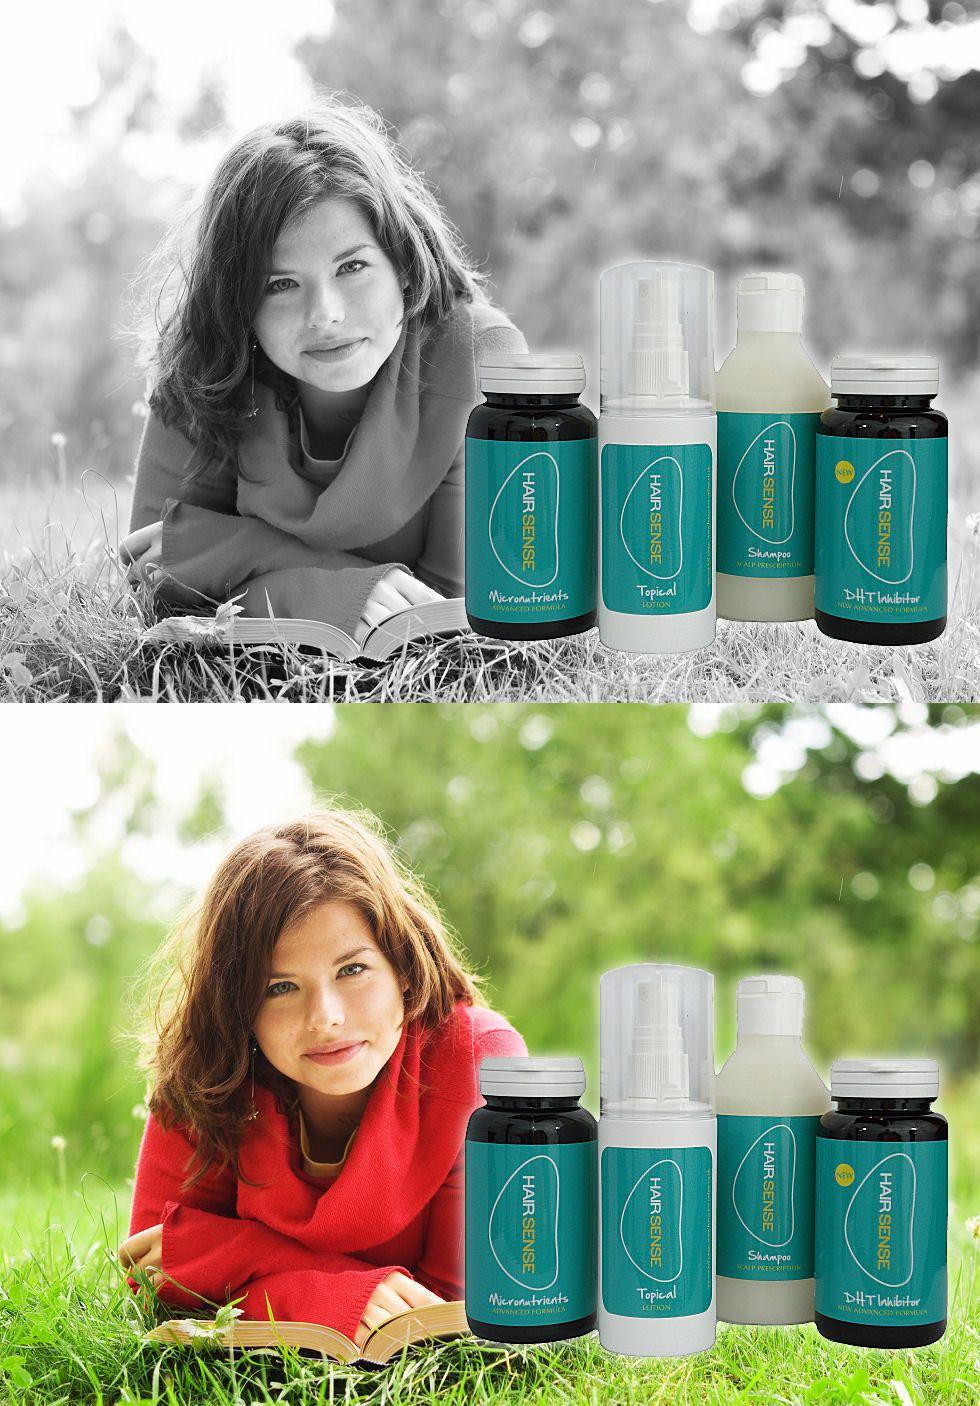 Proven Ways To Stop Hair Fall Hair Loss Growing Long Hair Faster Grow Long Hair Longe